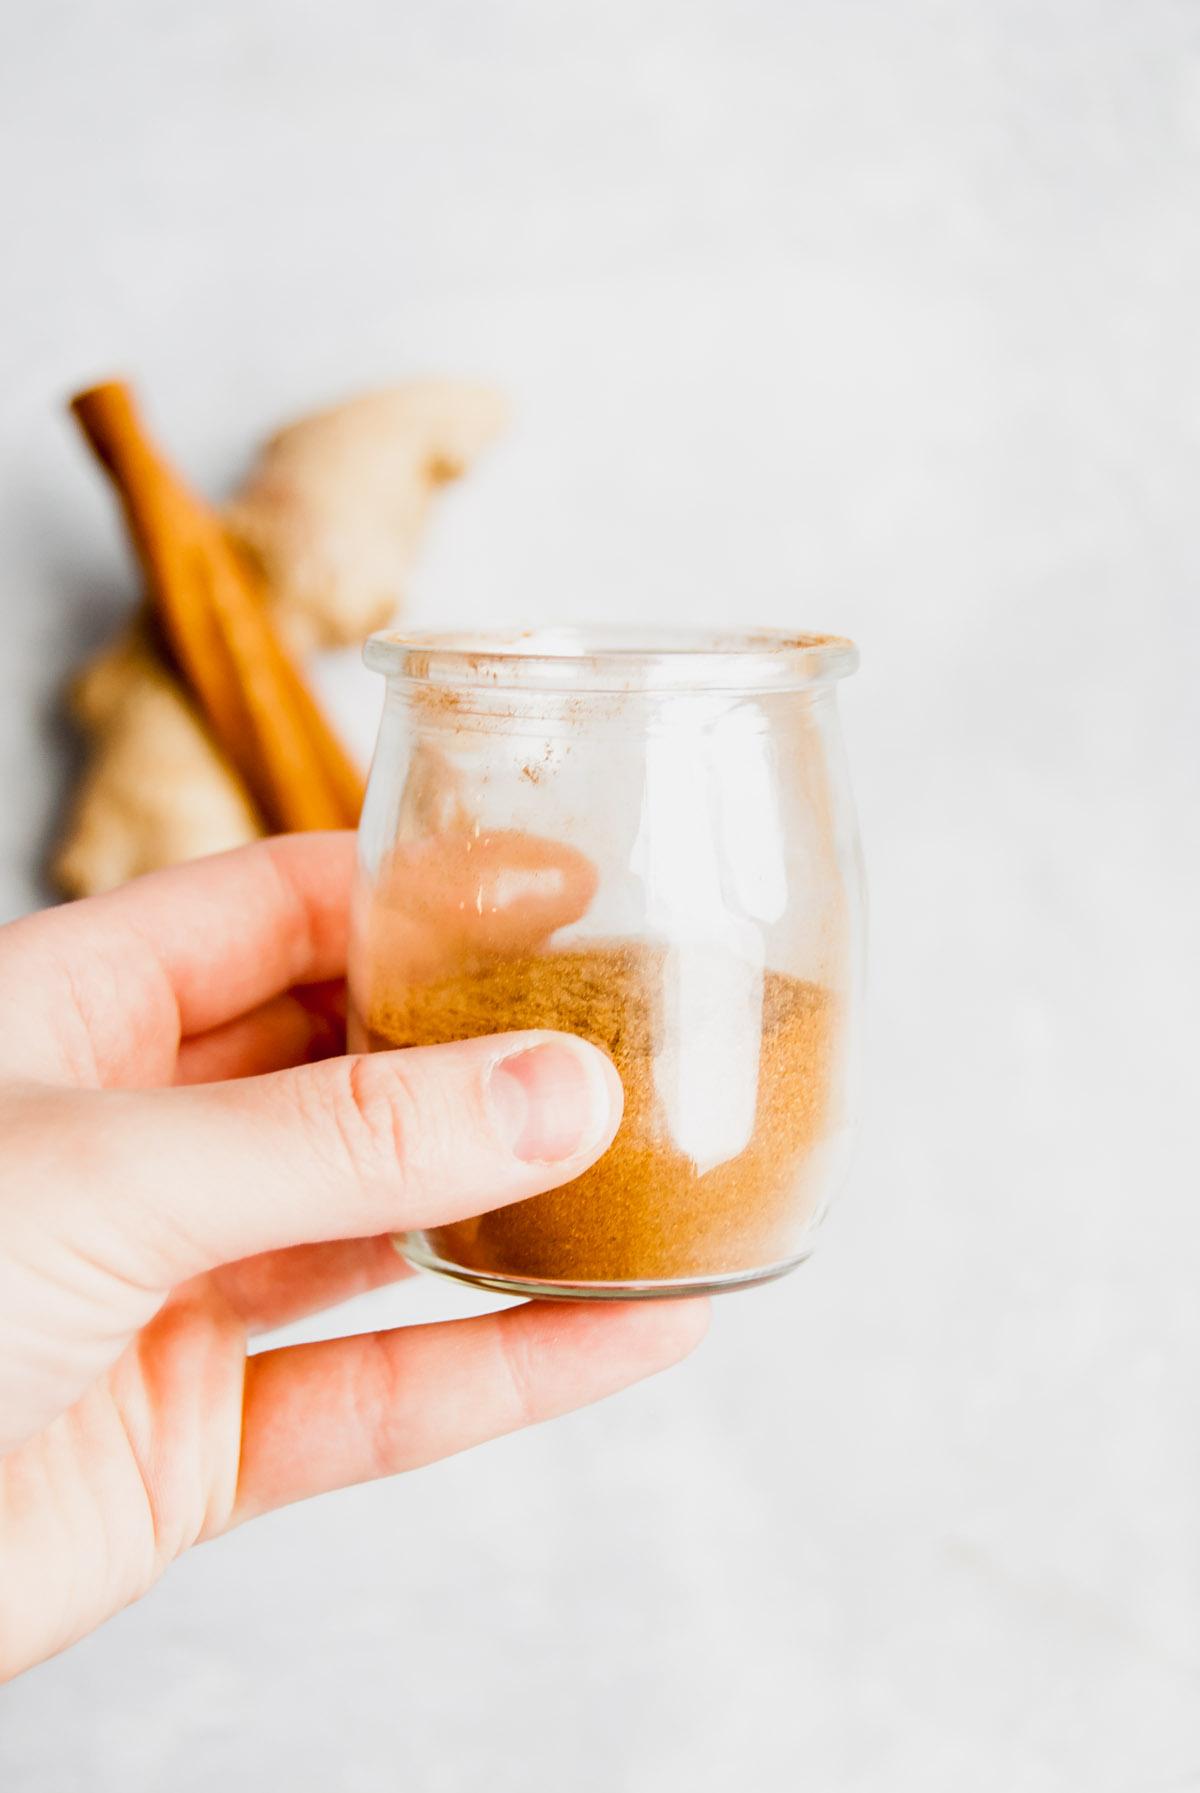 A hand holding up a jar of fall spice blend (aka pumpkin spice).